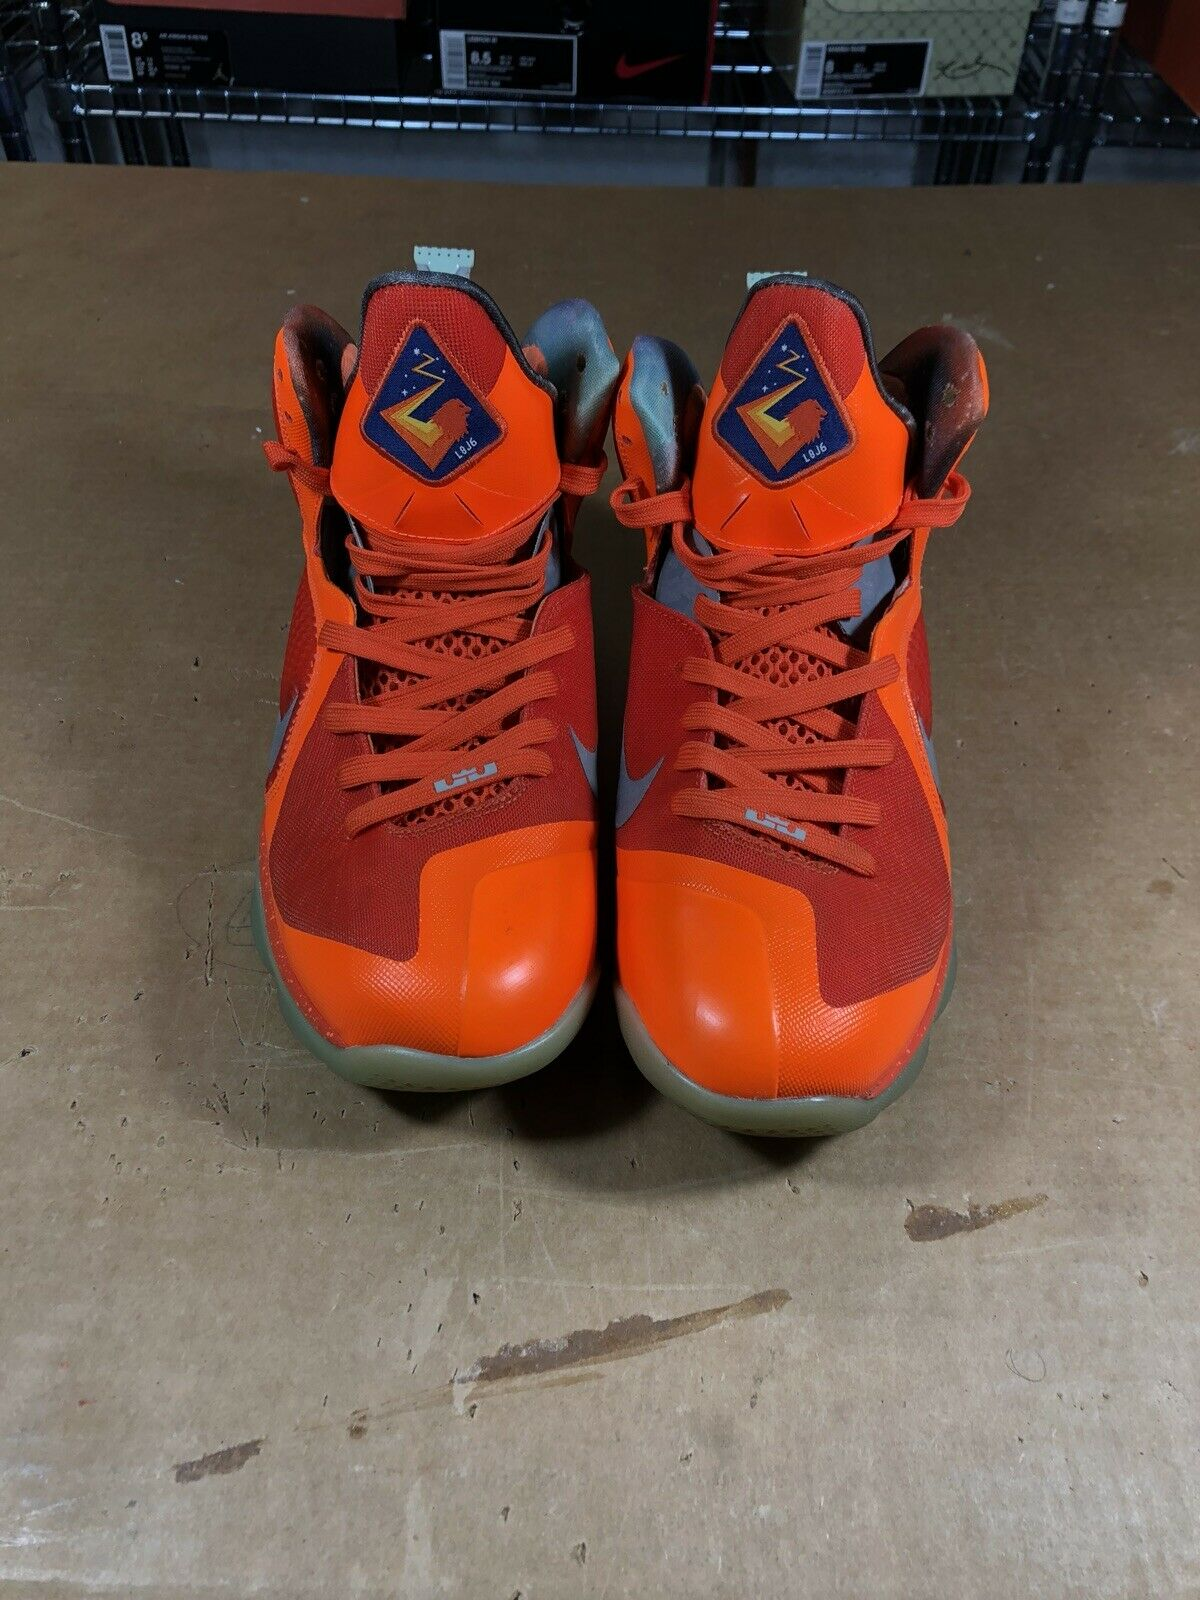 100% Authentic Nike Lebron 9 Big Bang AS Size 10.5 520811 800